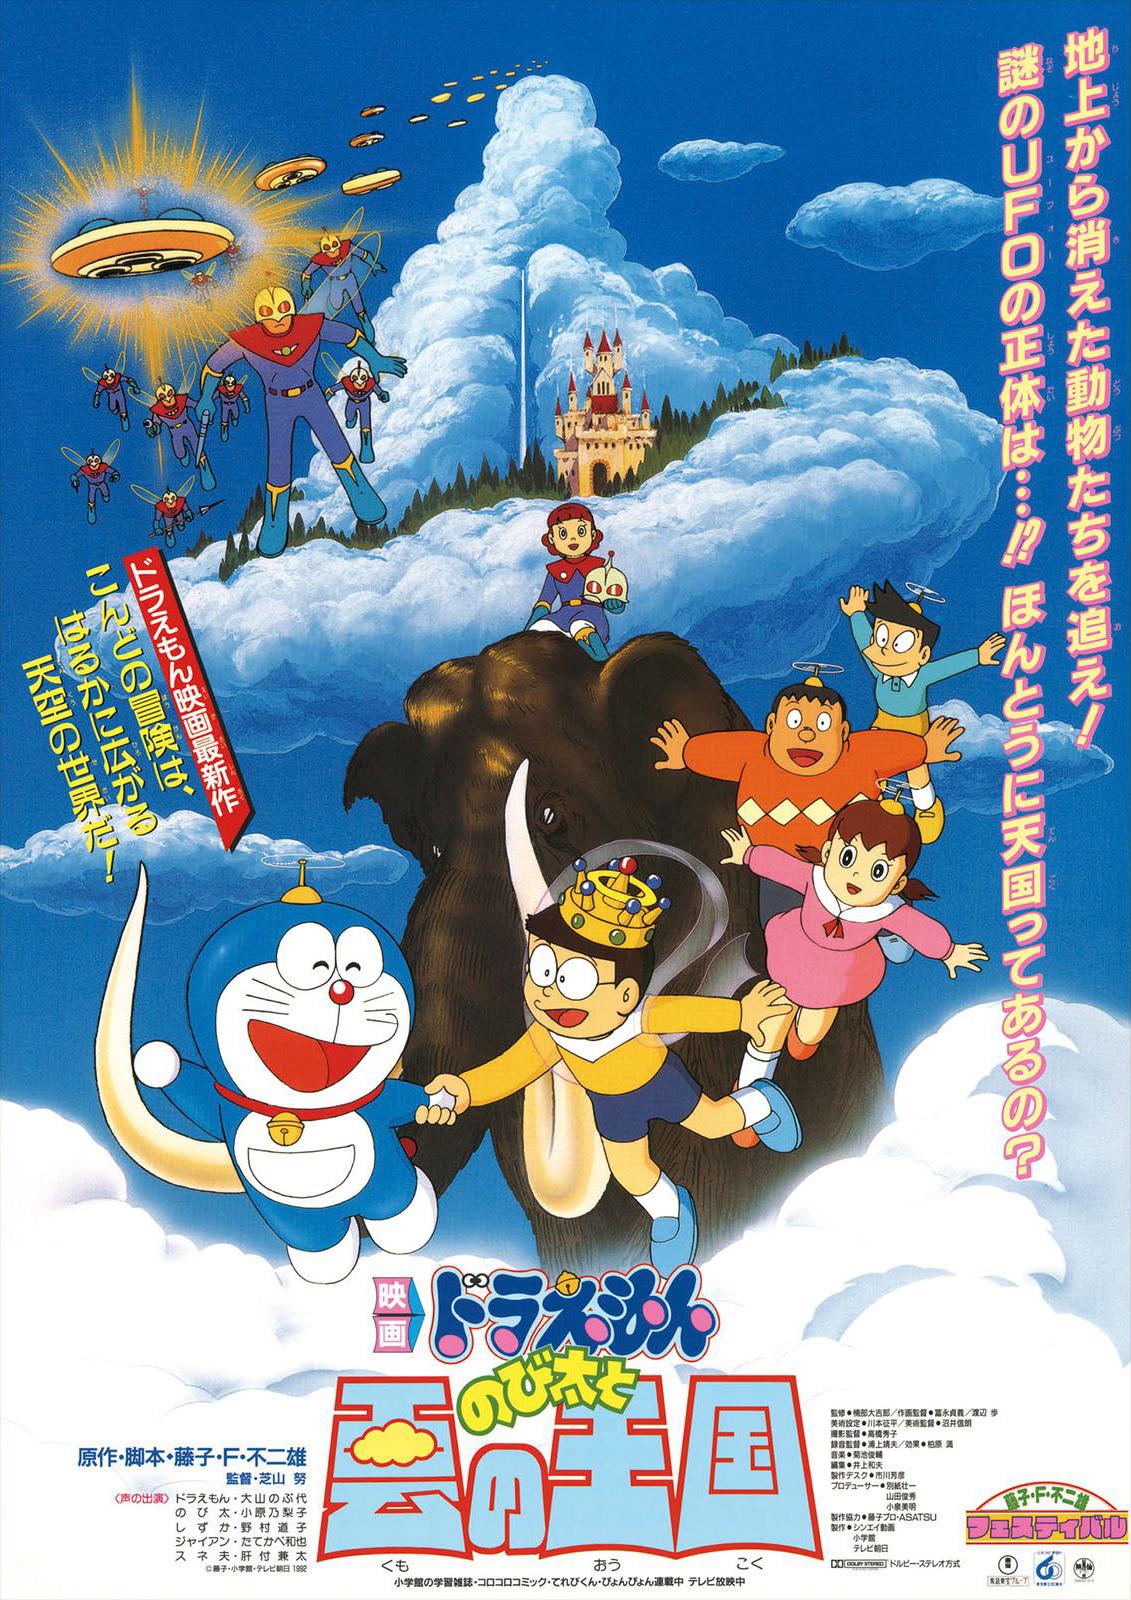 Doraemon The Movie 1992 โดเรม่อน เดอะมูฟวี่ ตอน บุกอาณาจักรเมฆ พากย์ไทย